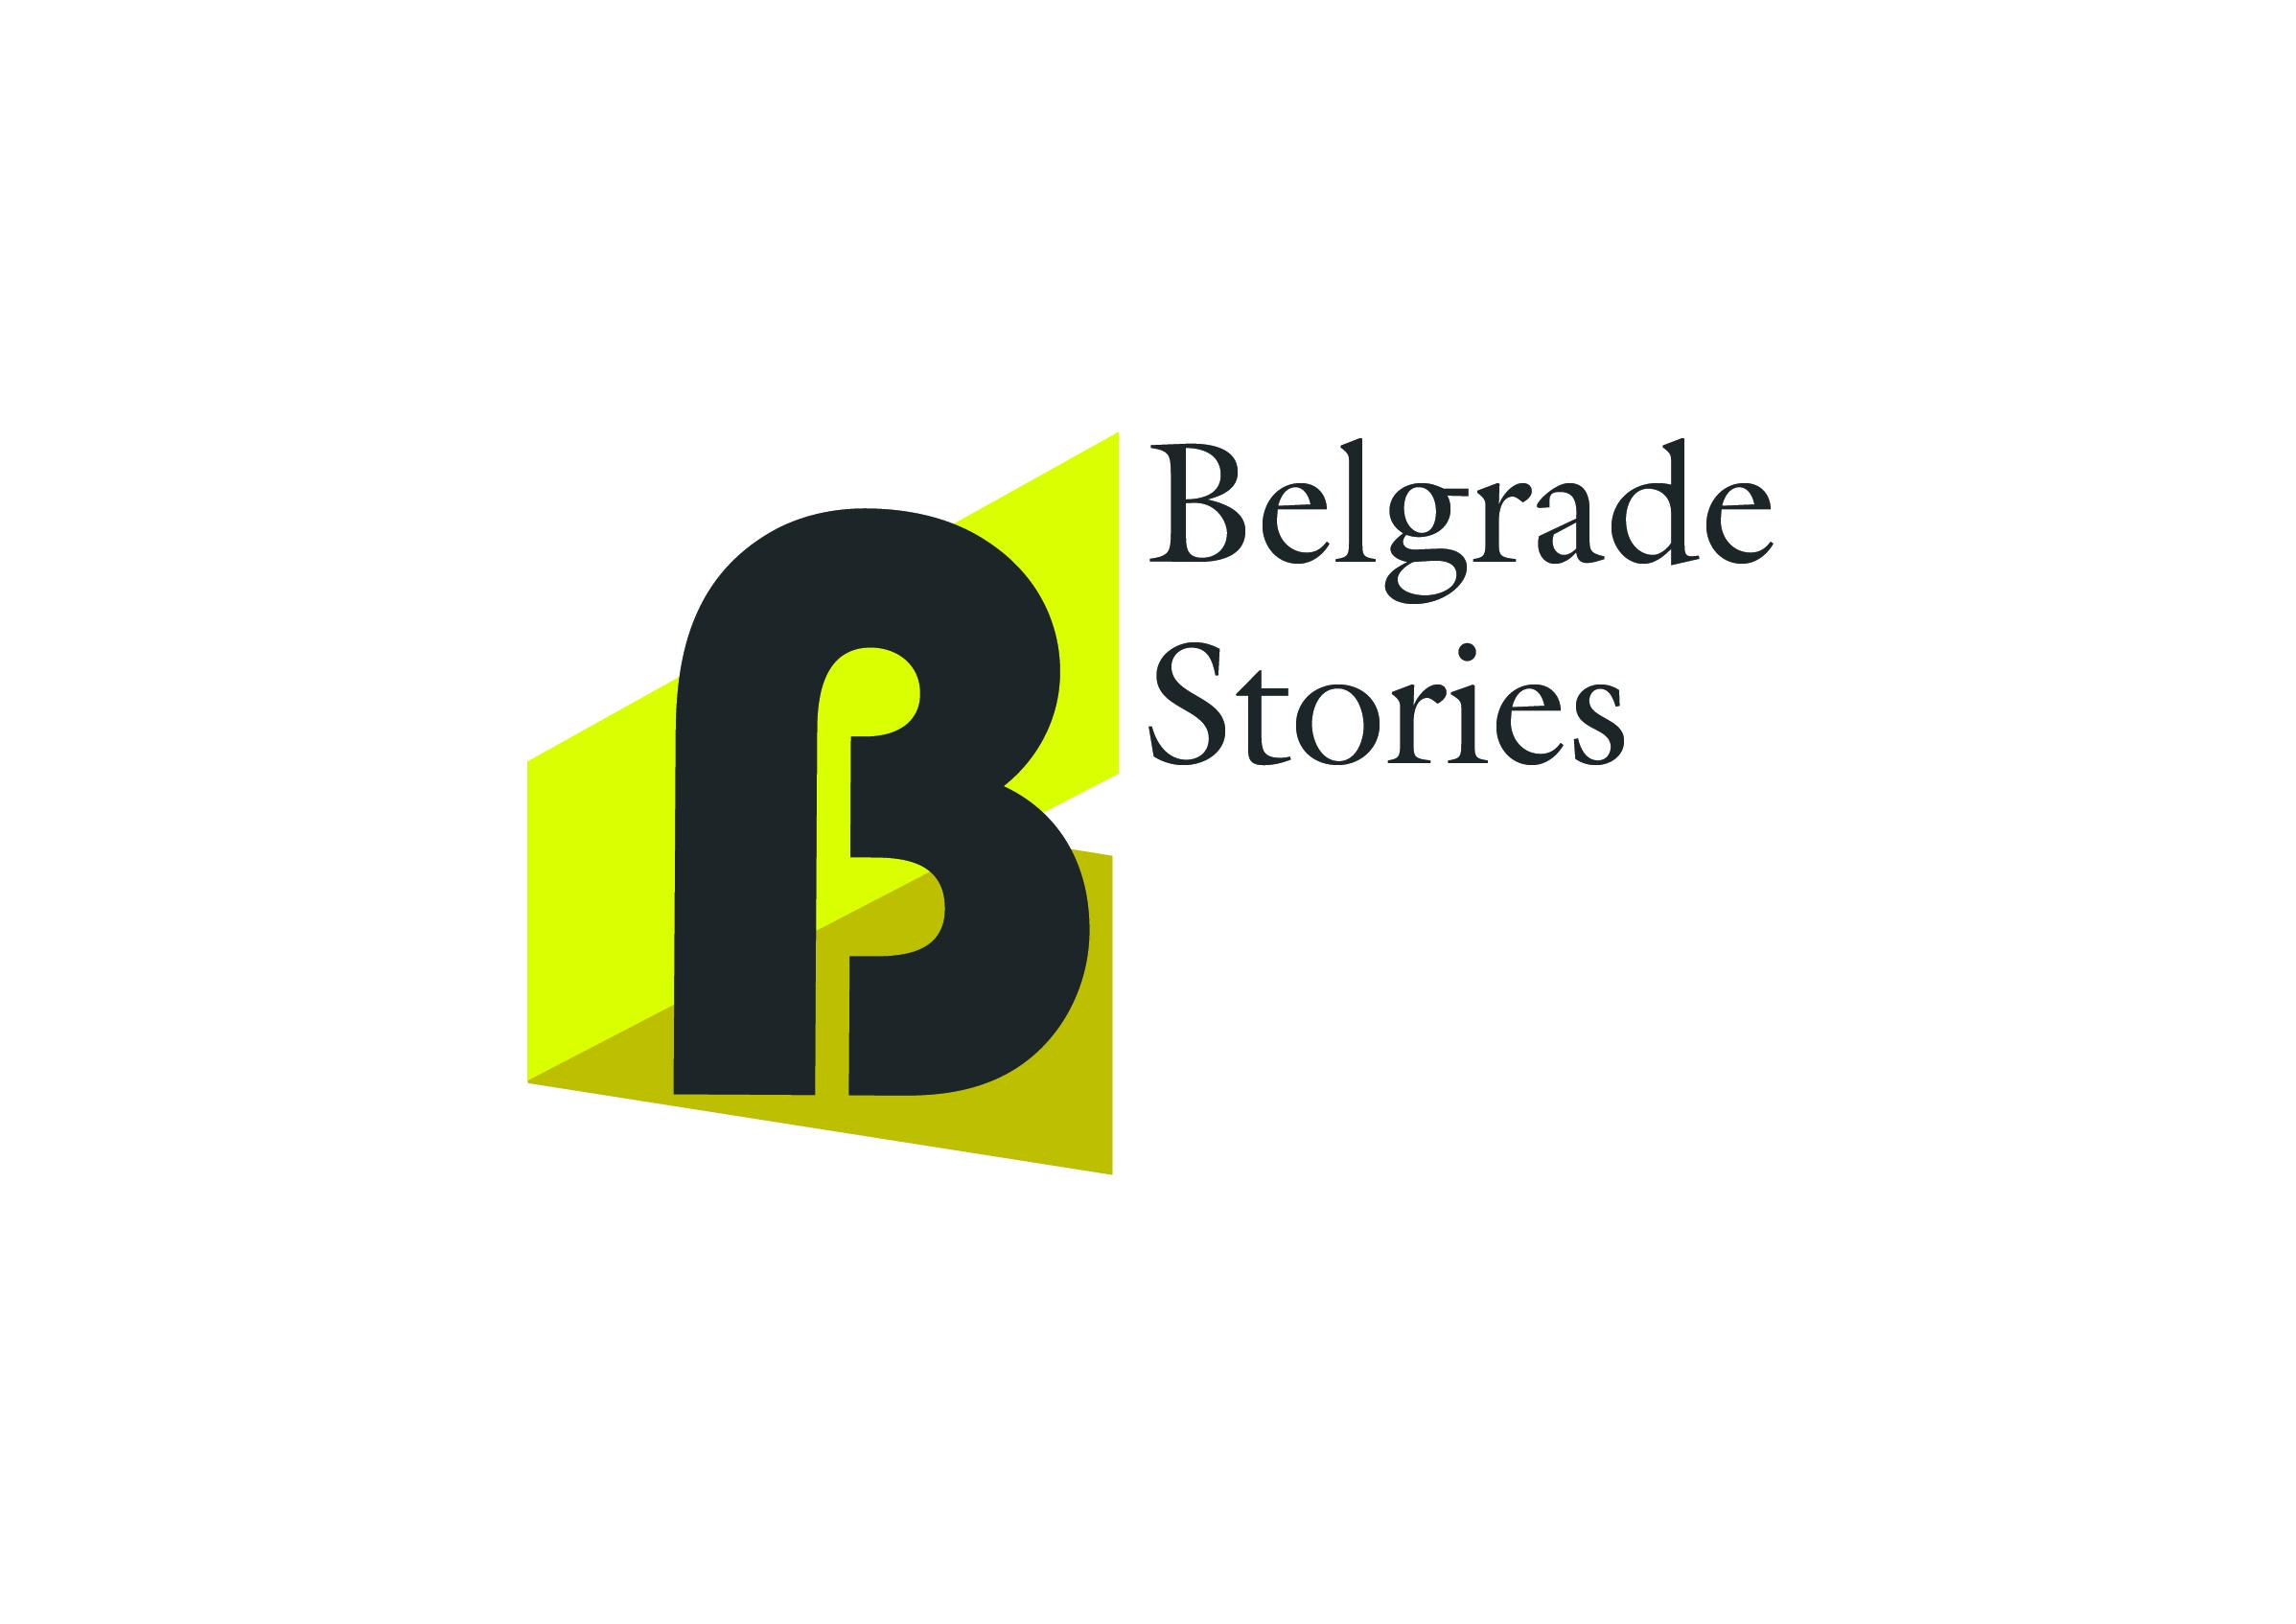 Логотип для агентства городских туров в Белграде фото f_506589b1bd7dffa6.jpg